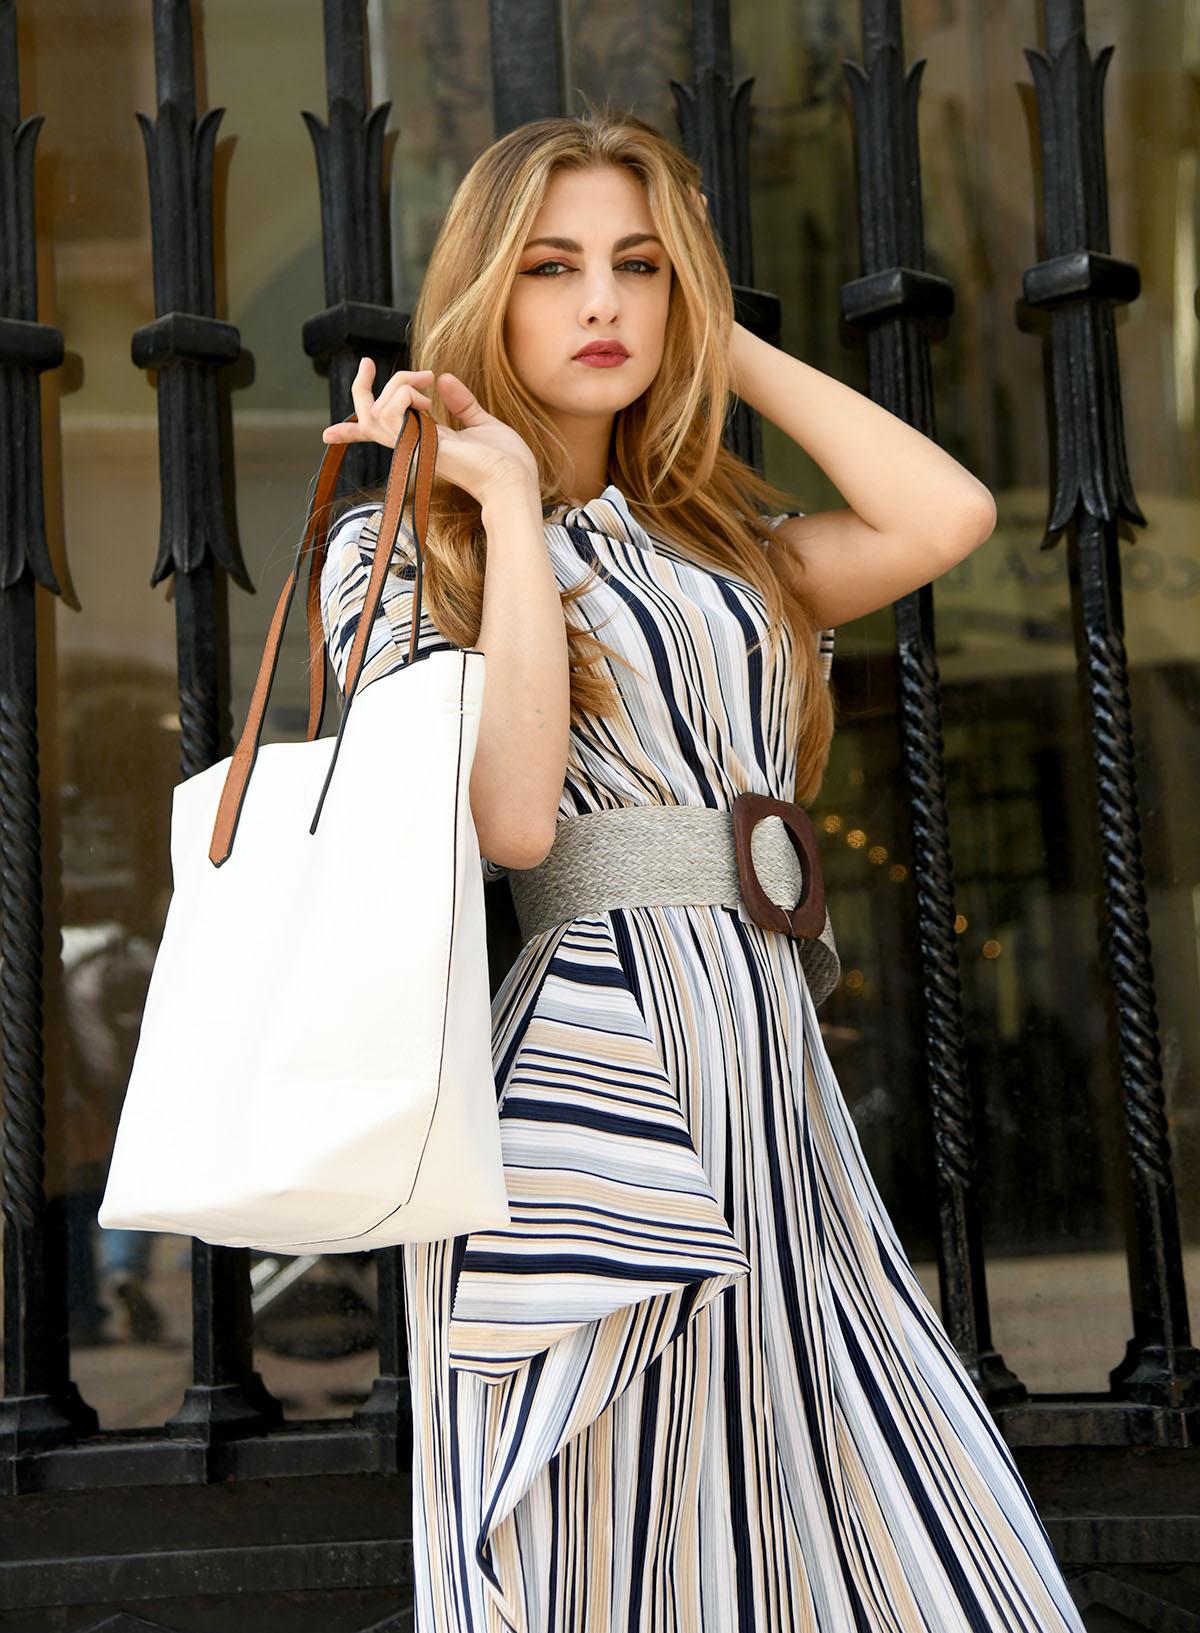 Extravagant shopping: Image Haddad